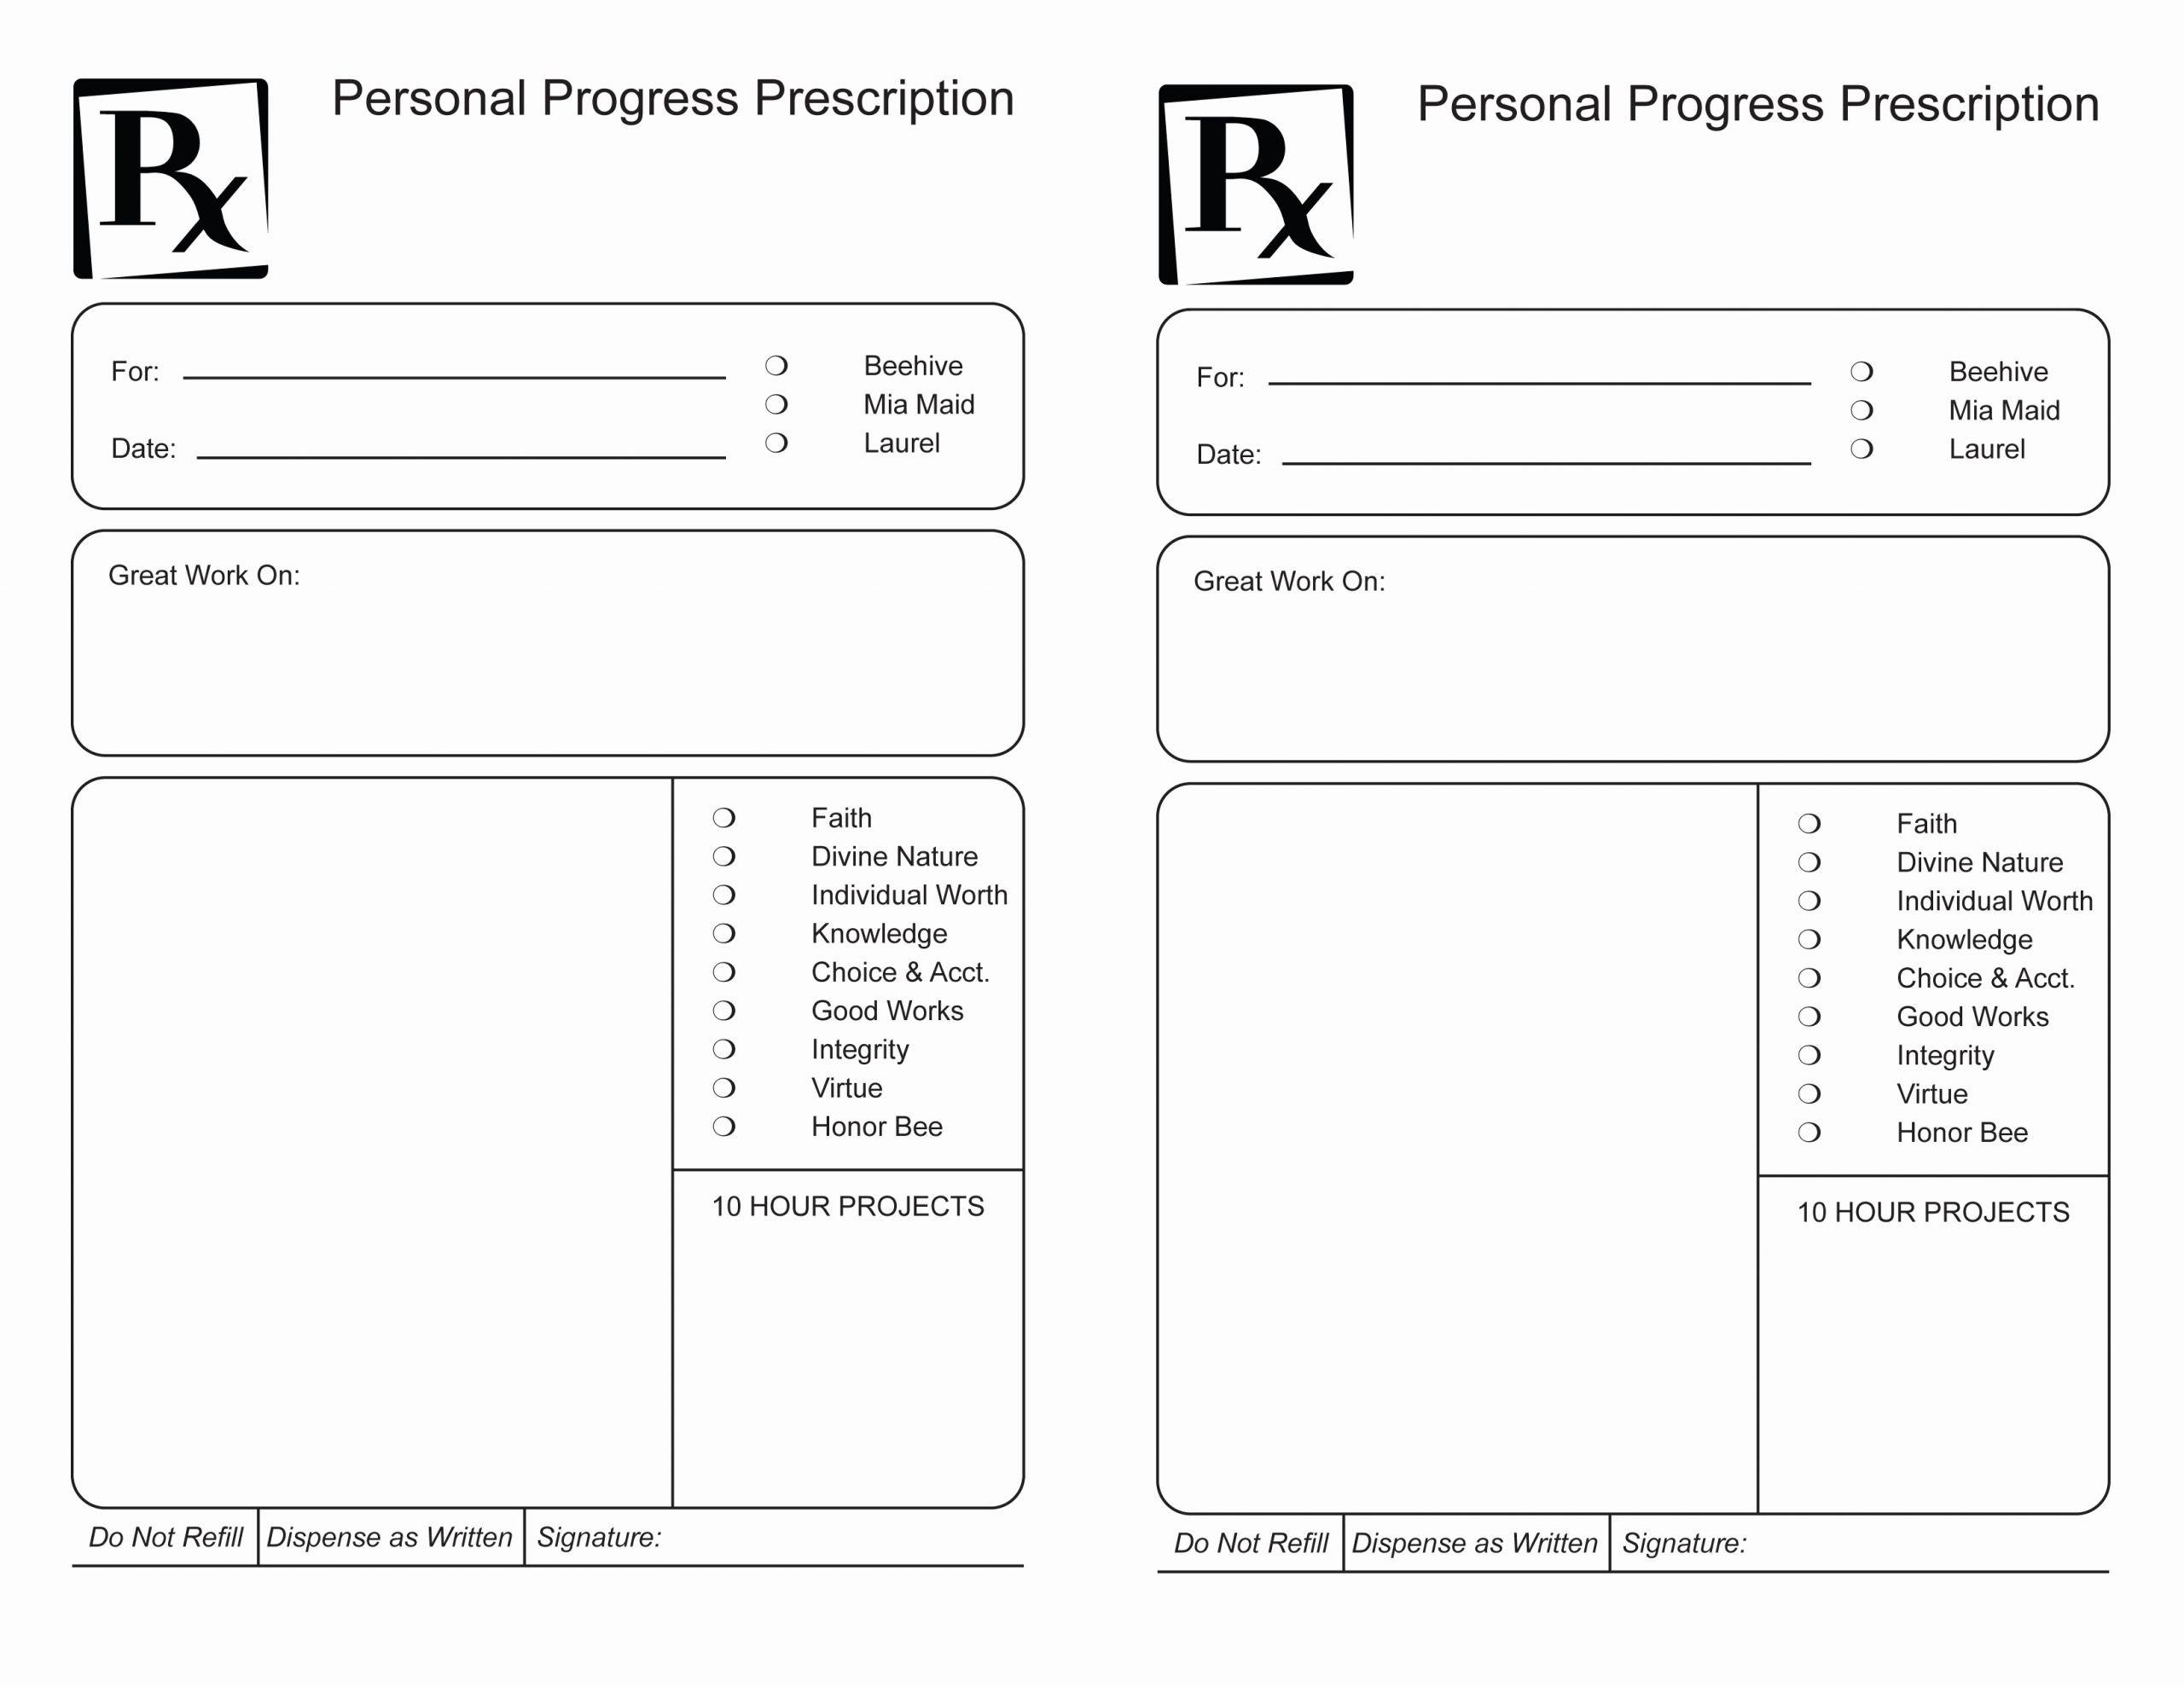 Prescription Pad Template Microsoft Word Fresh Personal Progress Prescription Pad – the Gospel Home